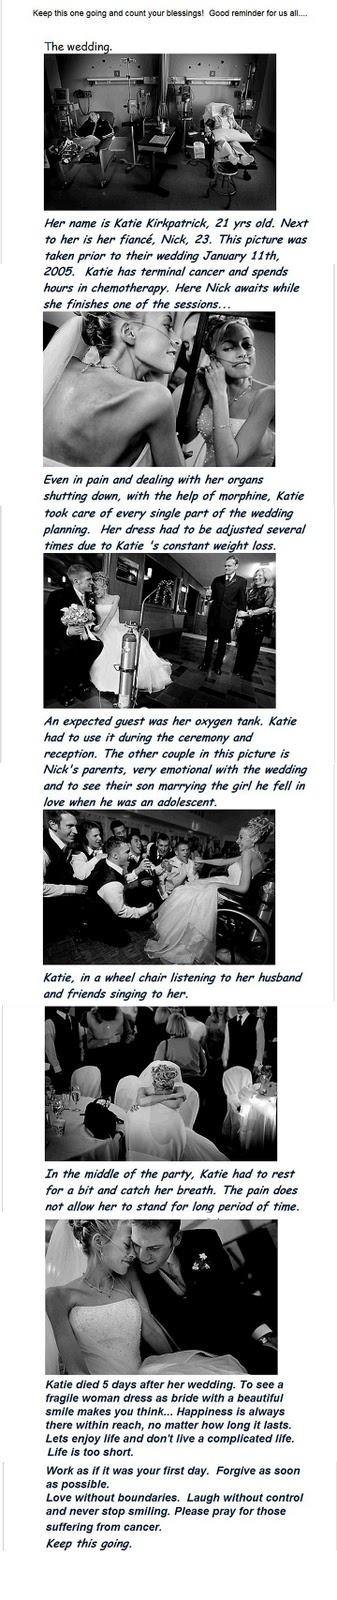 Michael Mancuso - PhotoJournal: The Wedding